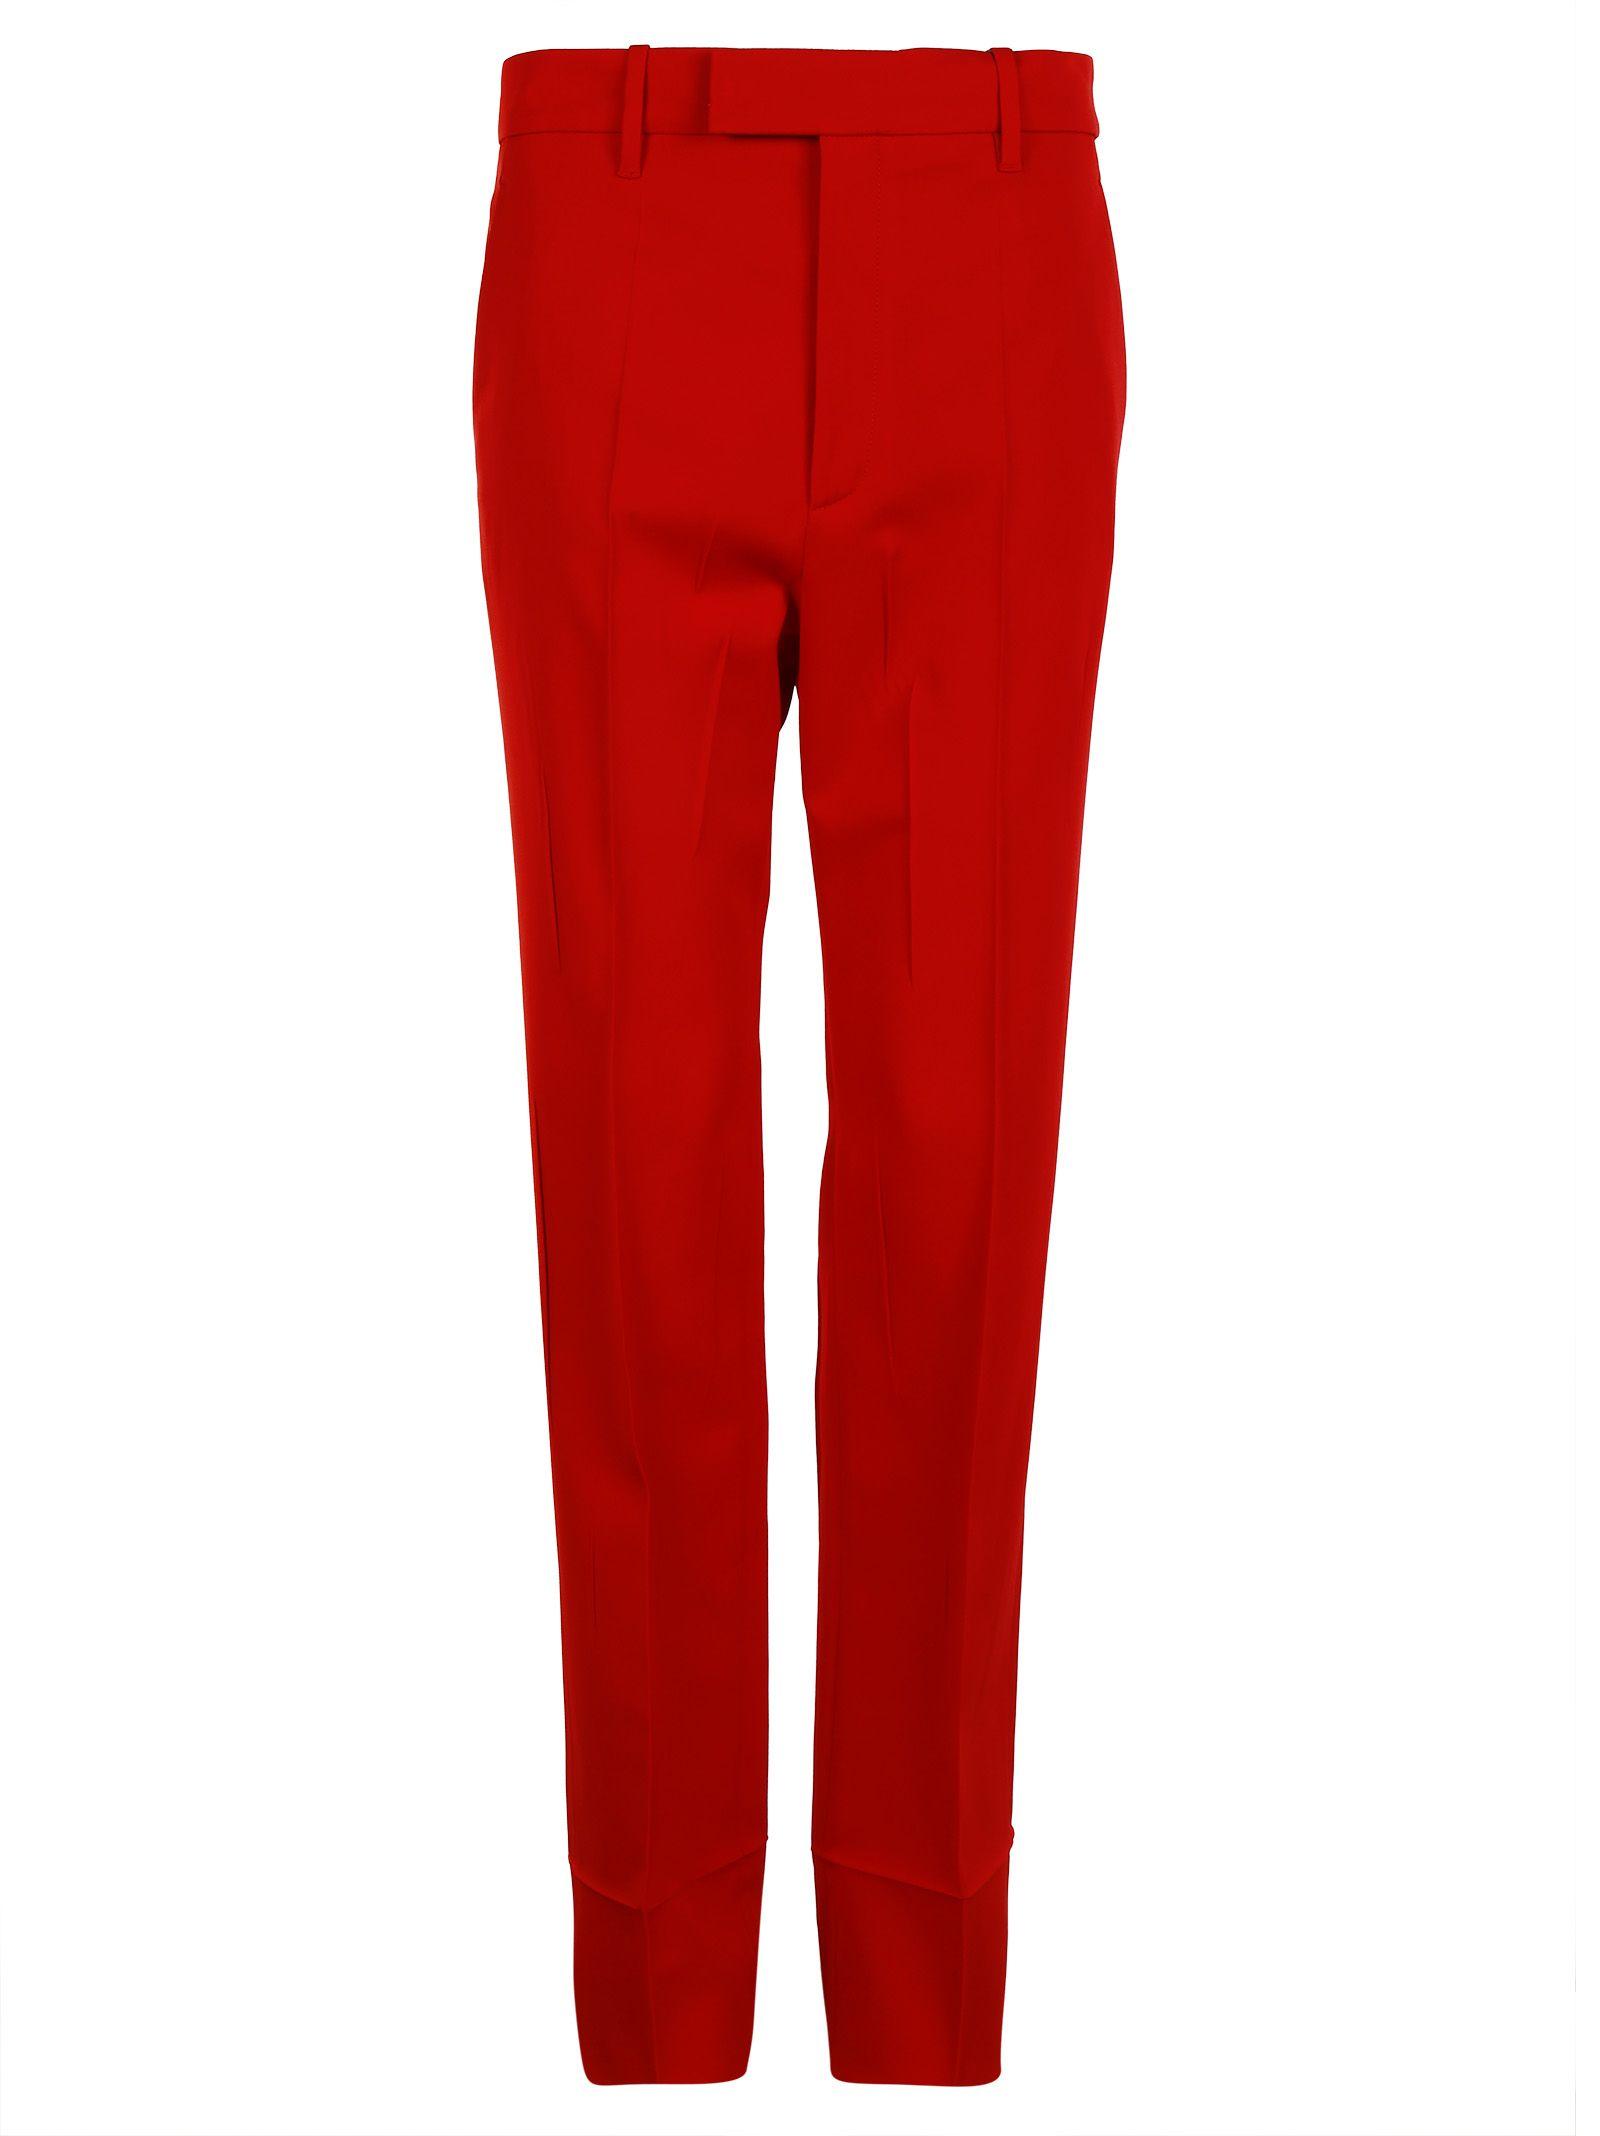 gucci pants. gucci stretch wool pants